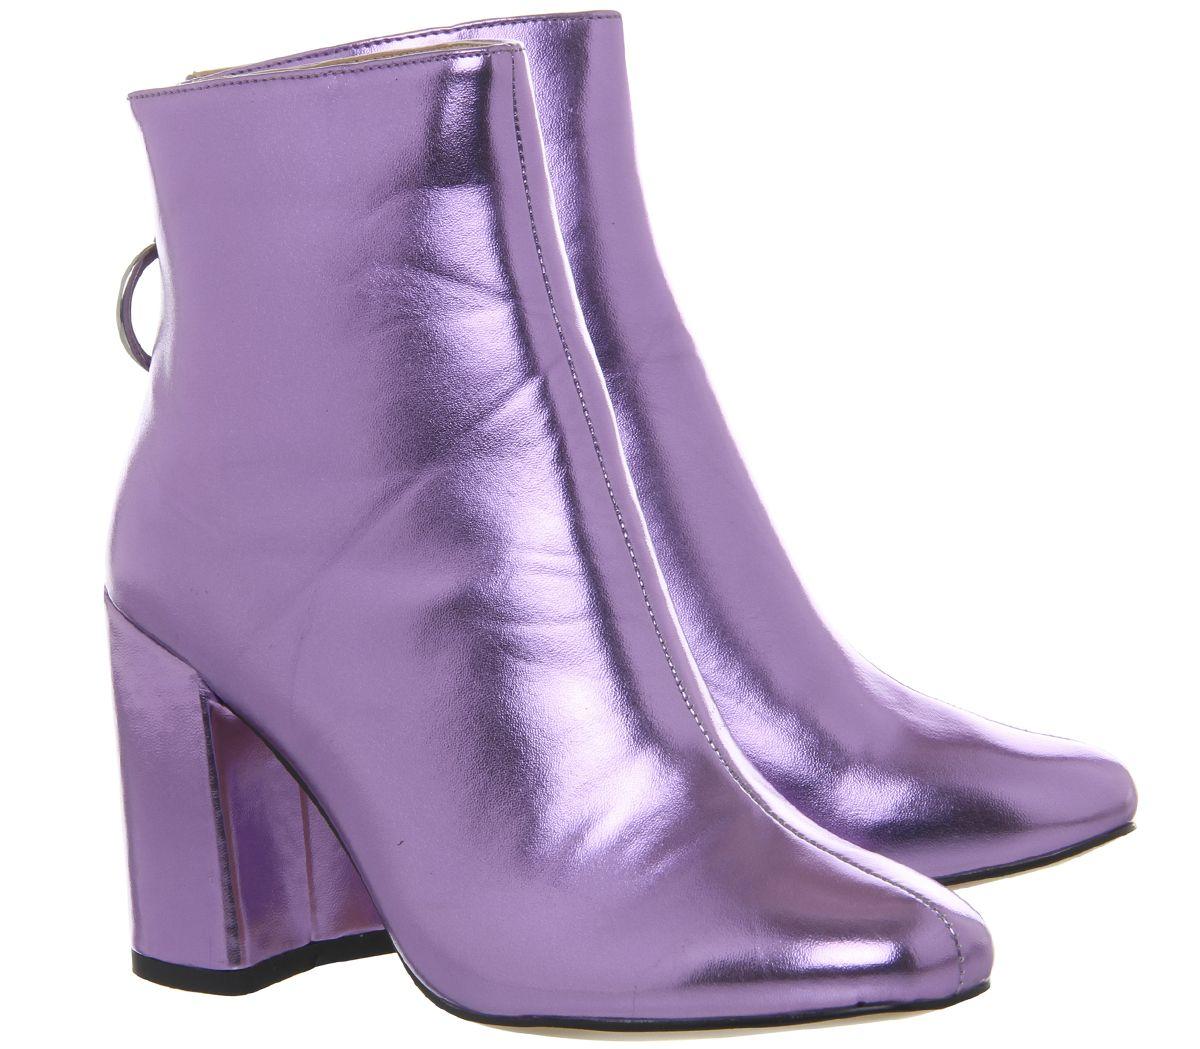 Womens Office Argon Block Heel Back Zip Boots Lilac Metallic Boots